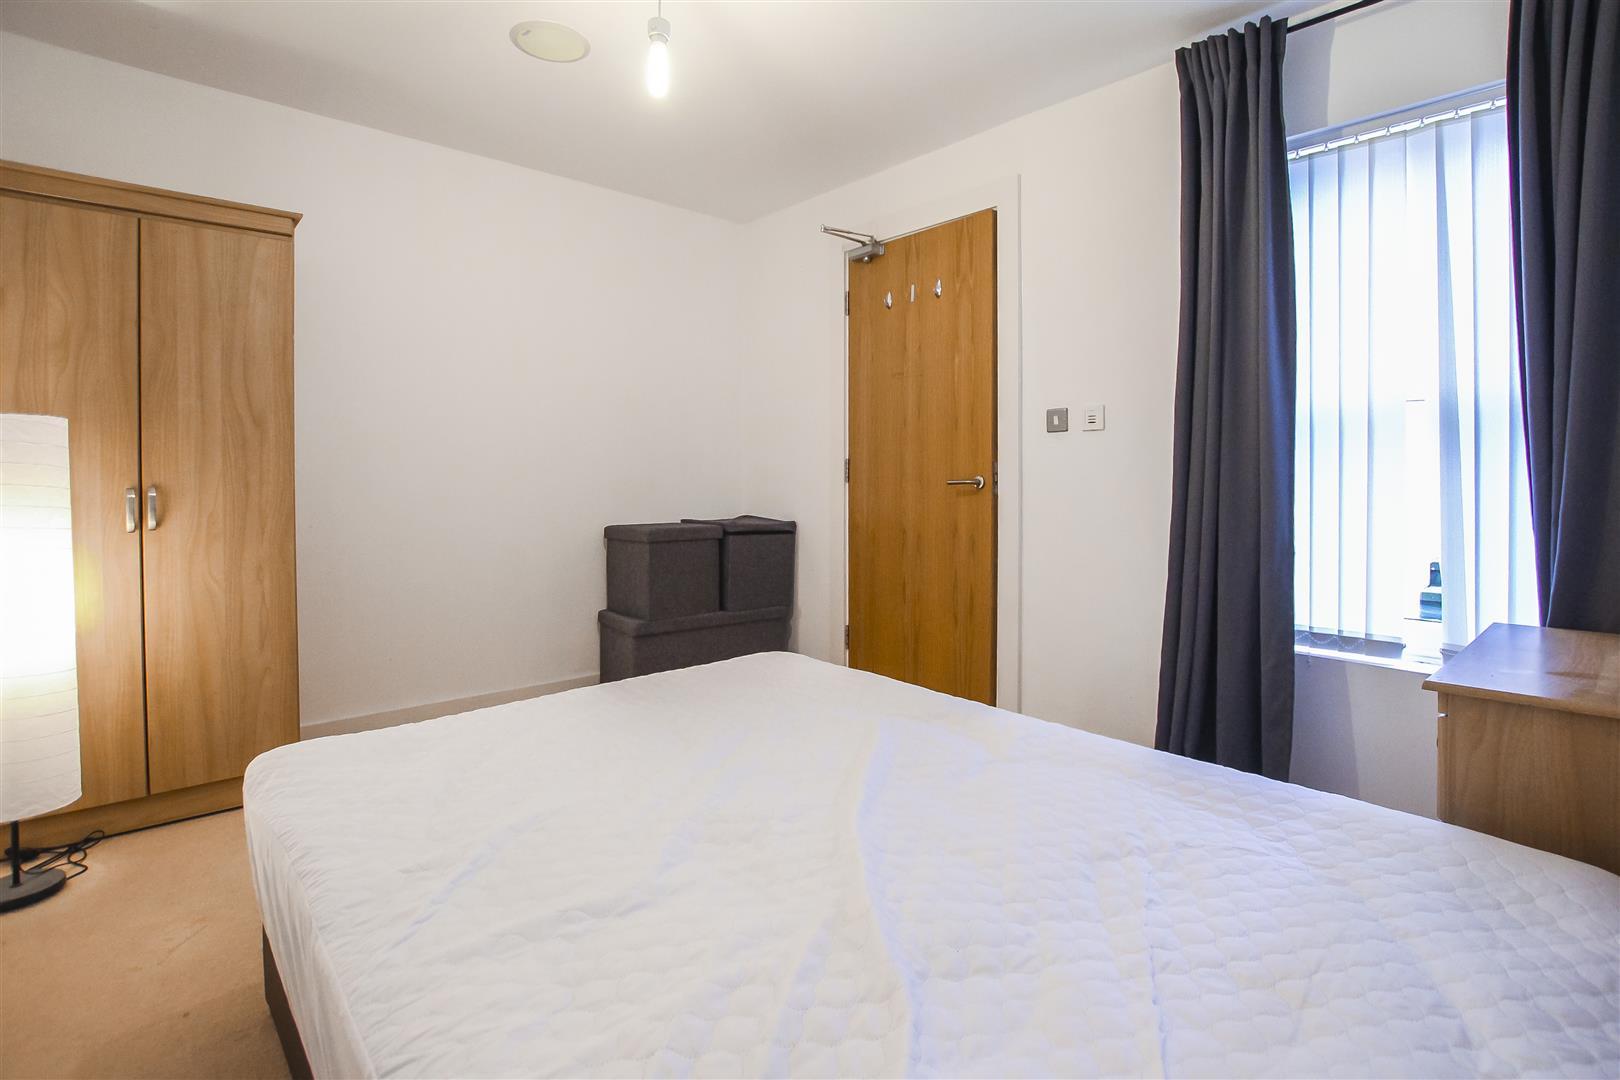 2 Bedroom Apartment For Sale - Bedroom